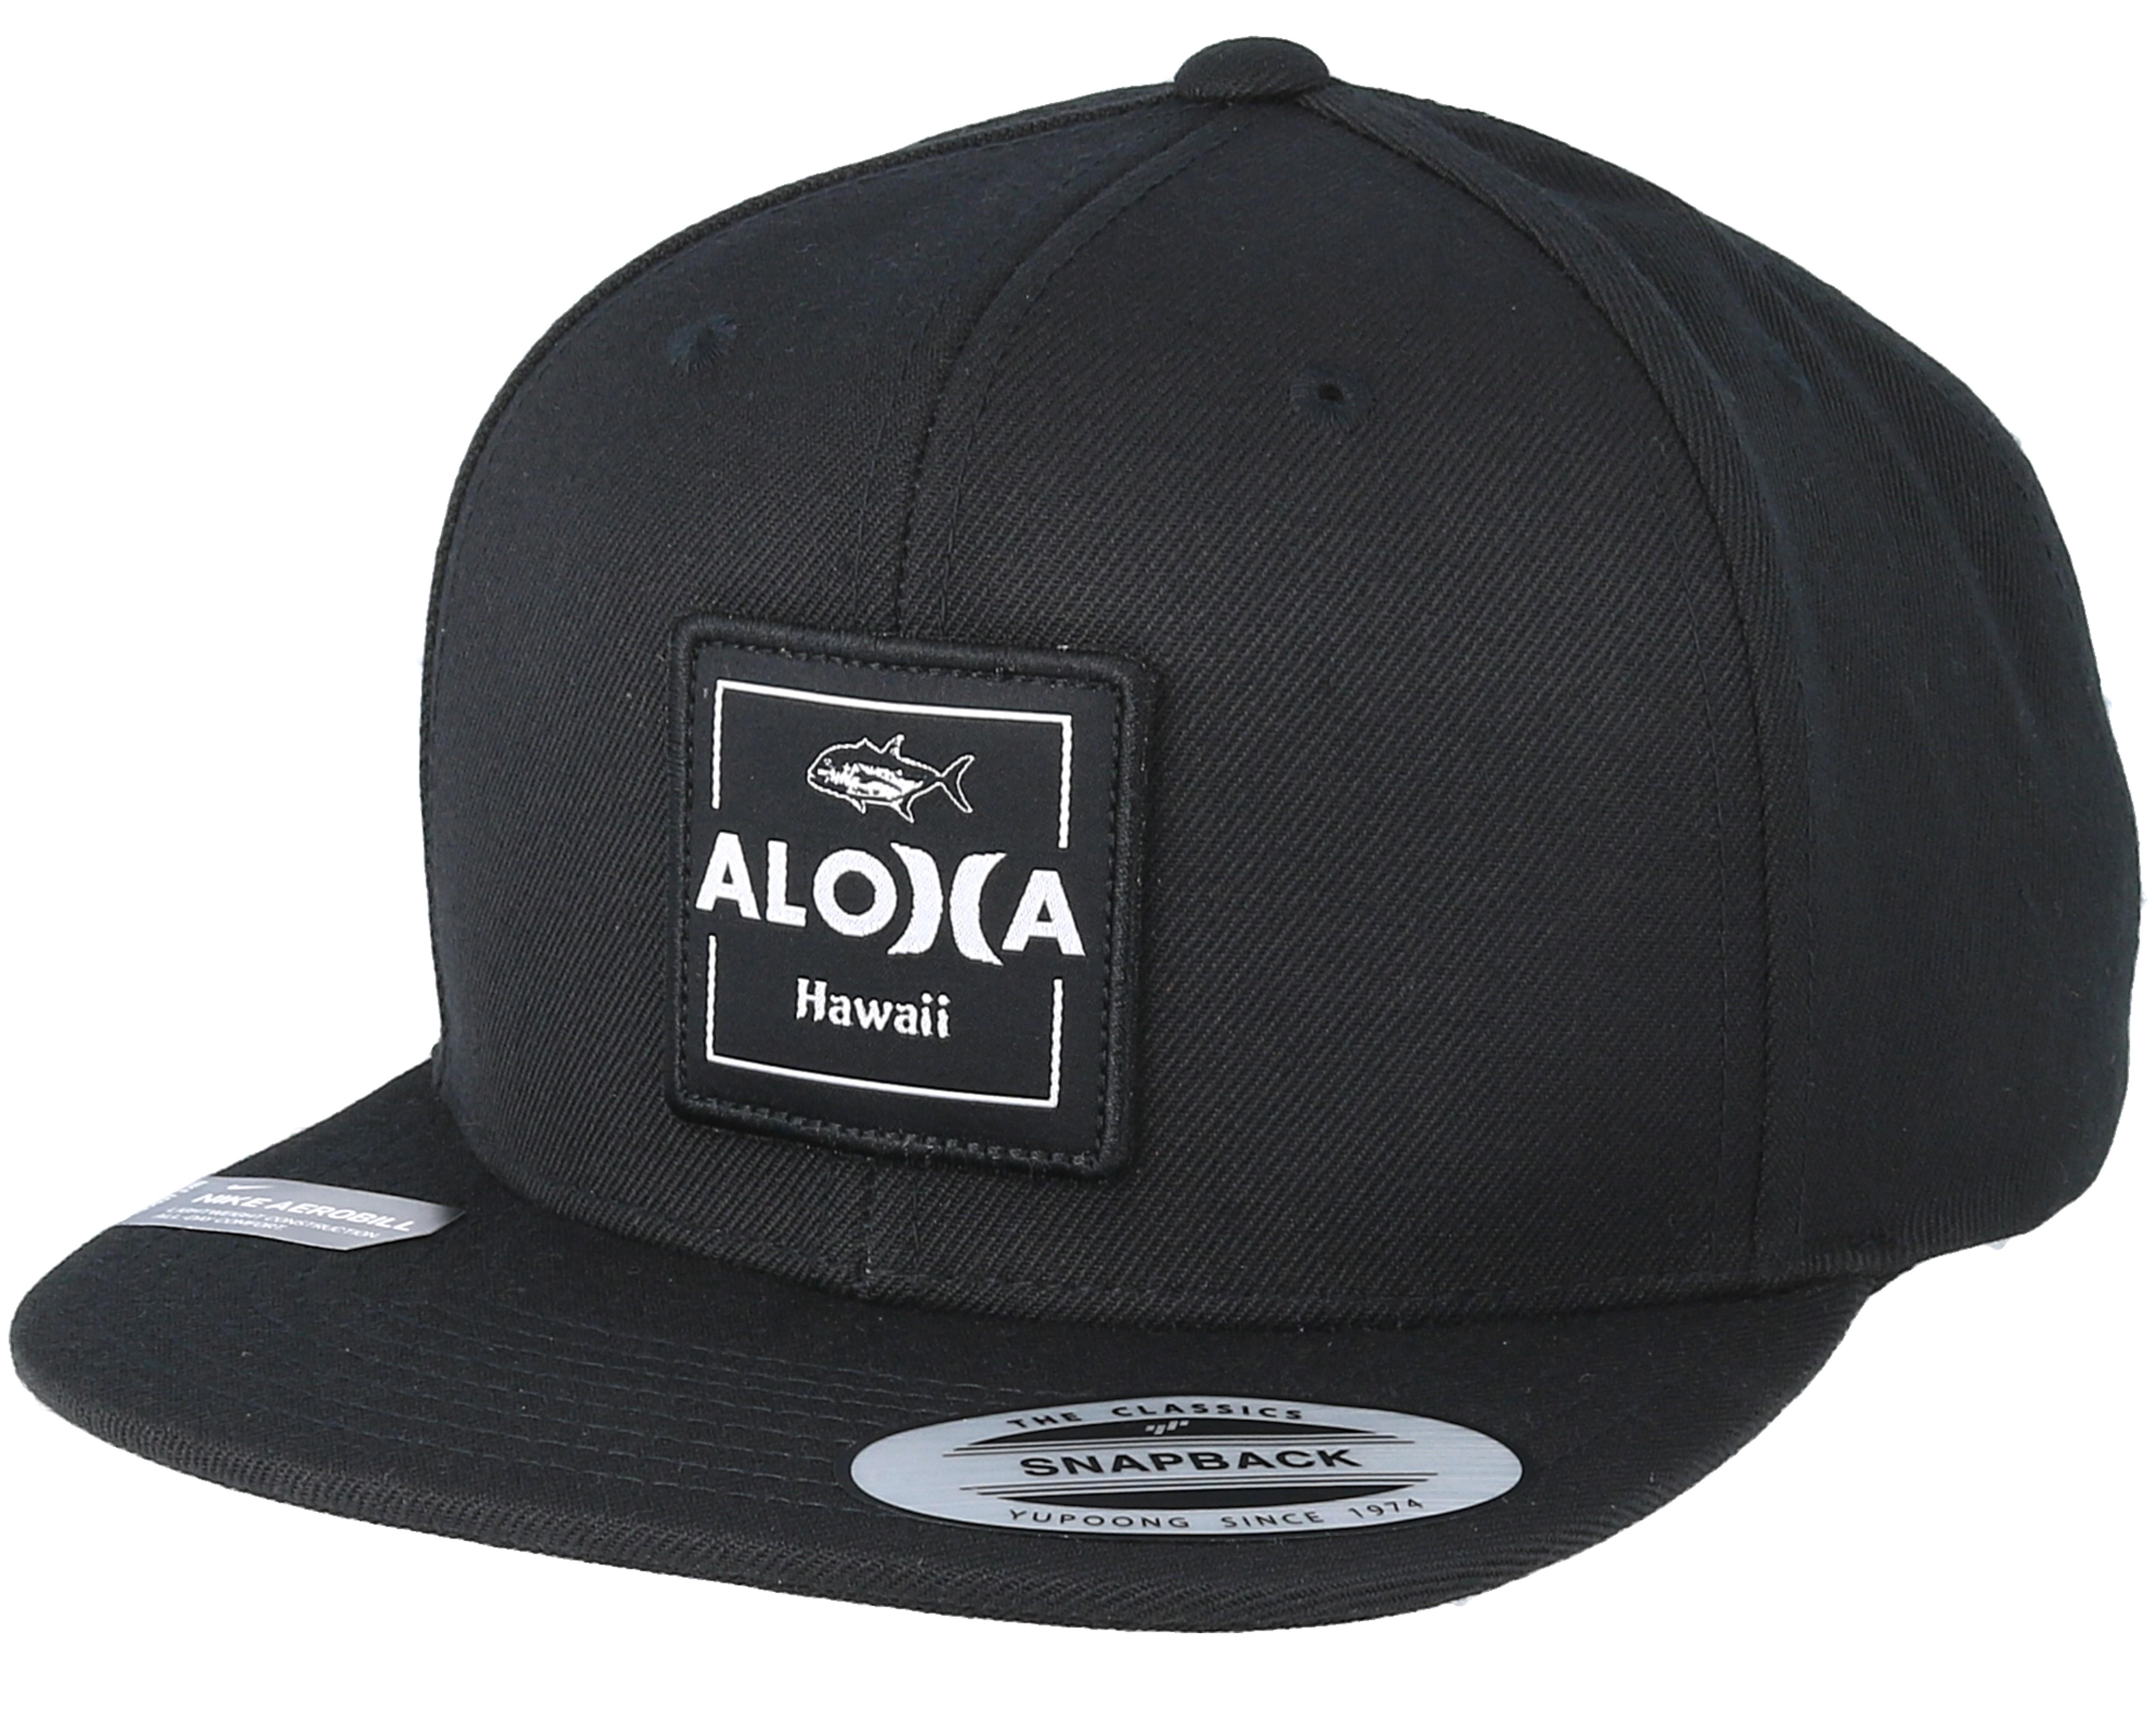 68e4c6967931f ... ireland aloha cruiser black snapback hurley caps hatstore a7739 f8e7d